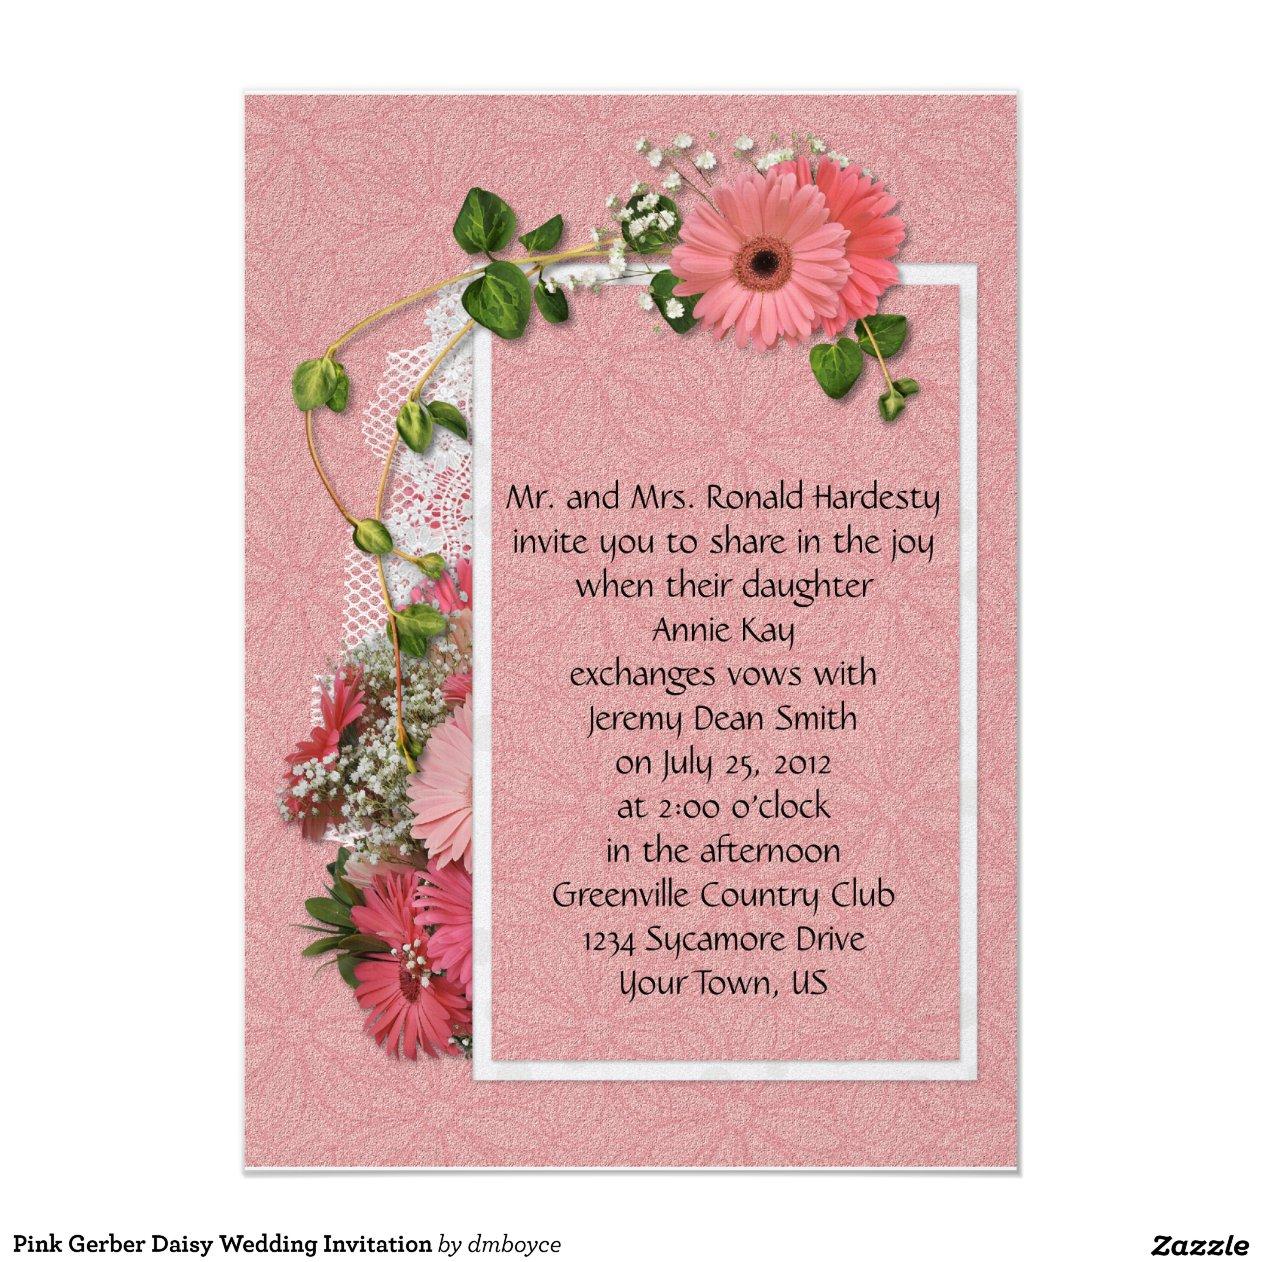 pink_gerber_daisy_wedding_invitation ...